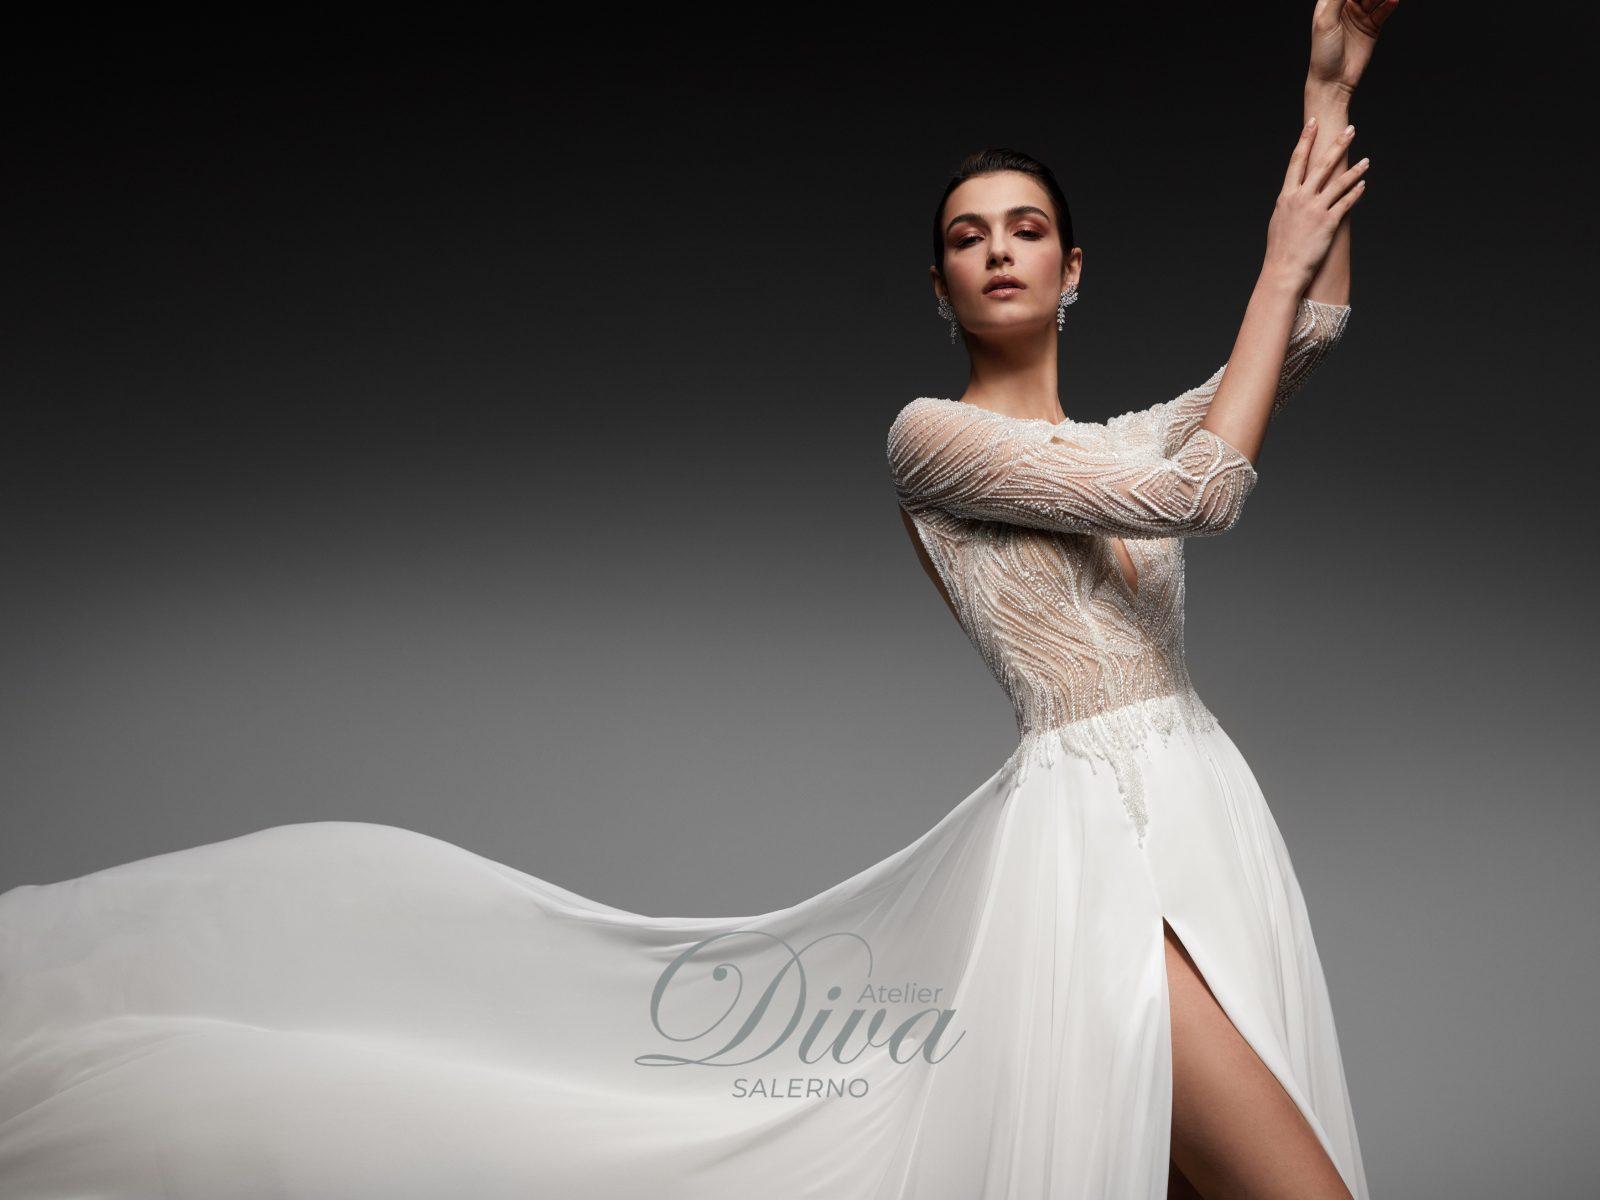 Atelier Diva Salerno